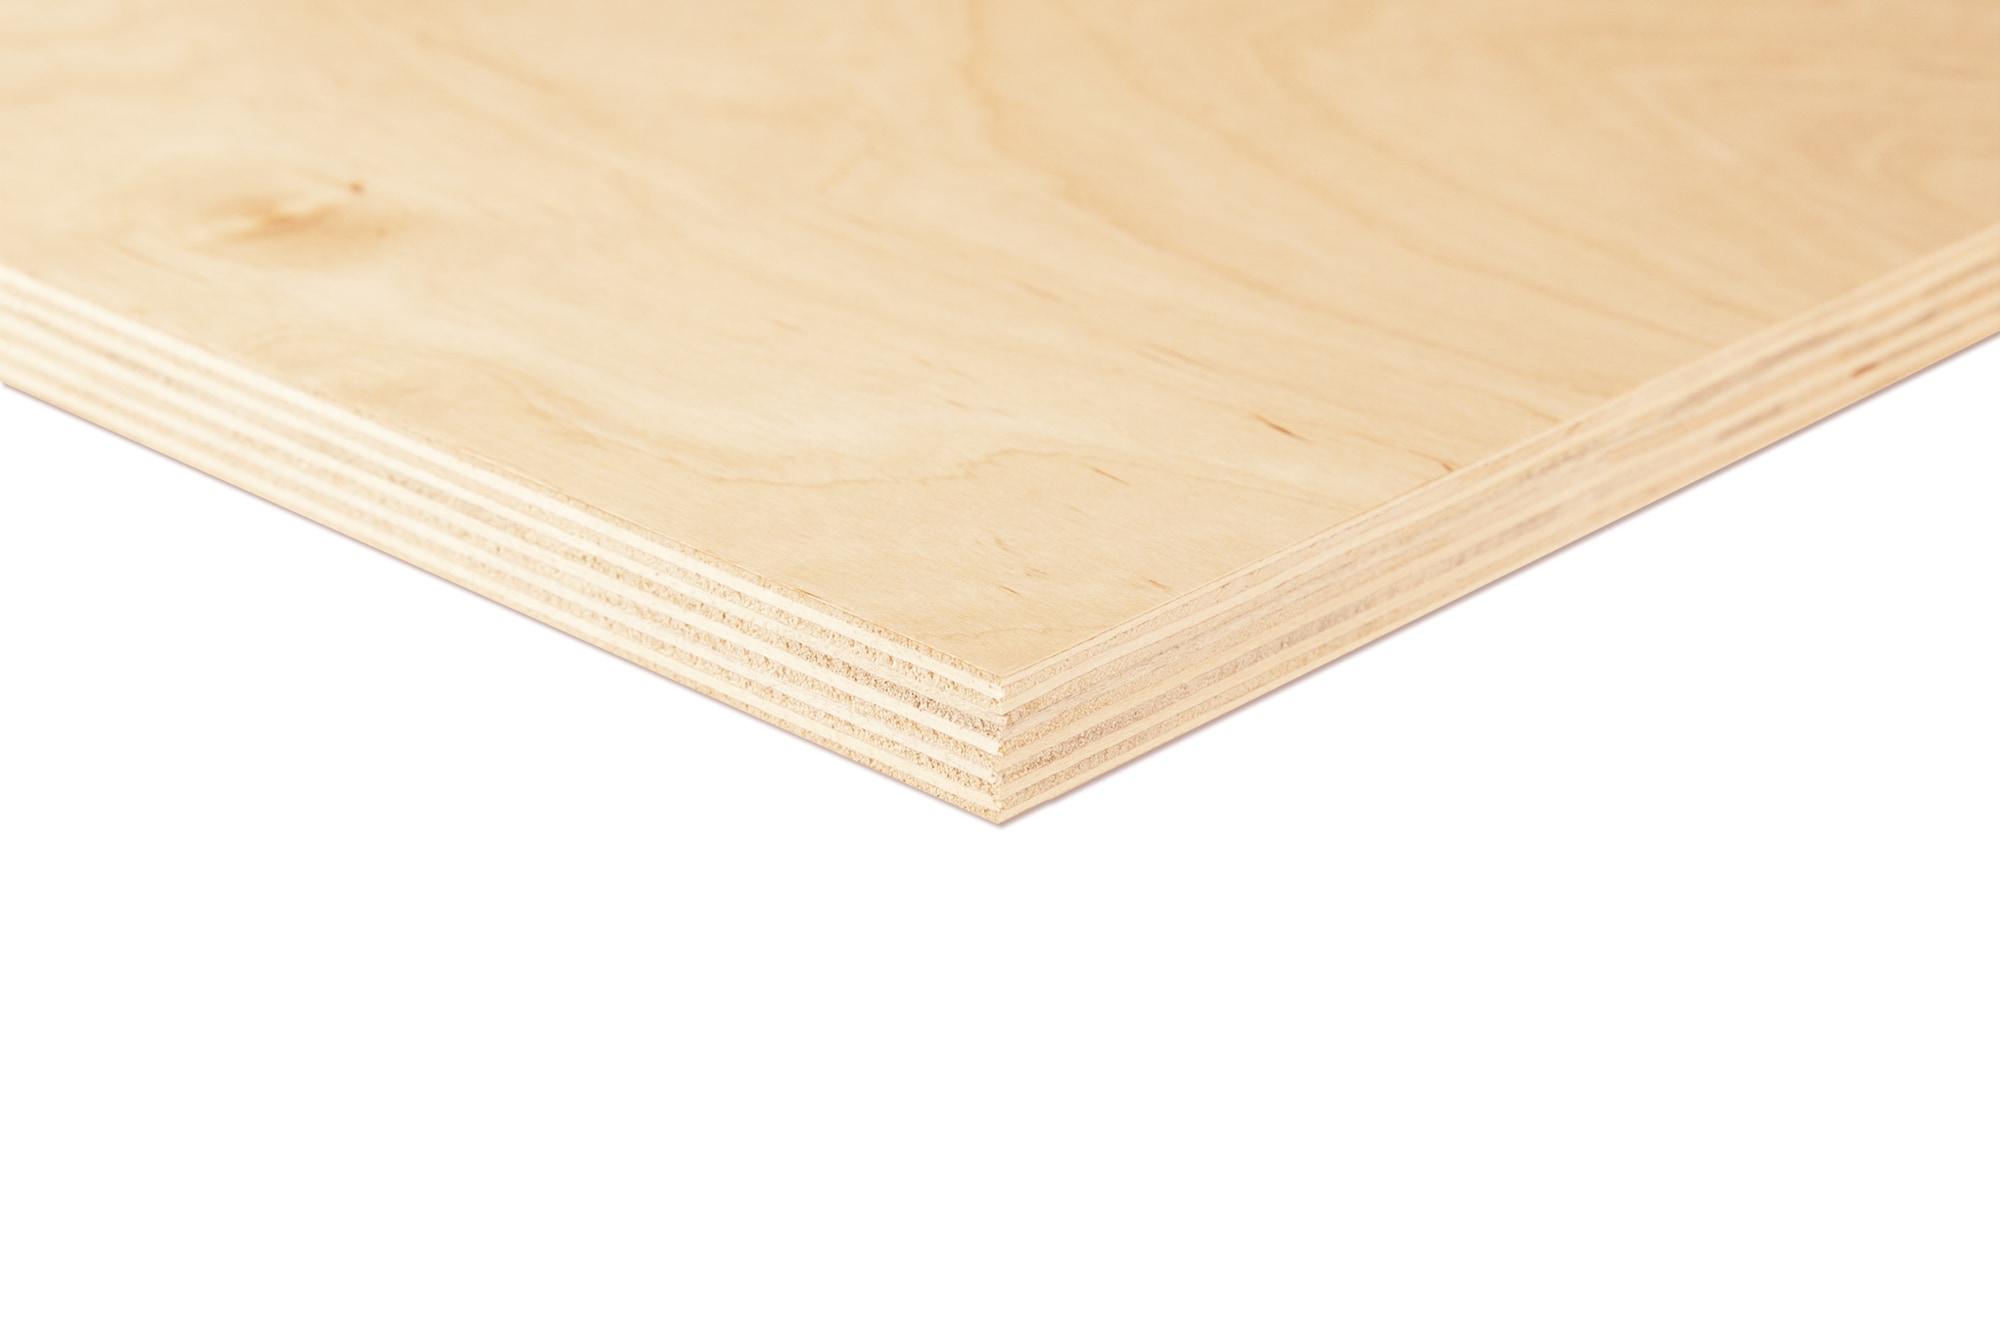 Sanply Prefinished Birch Plywood C D Grade 3 4 25 Sheet Pack